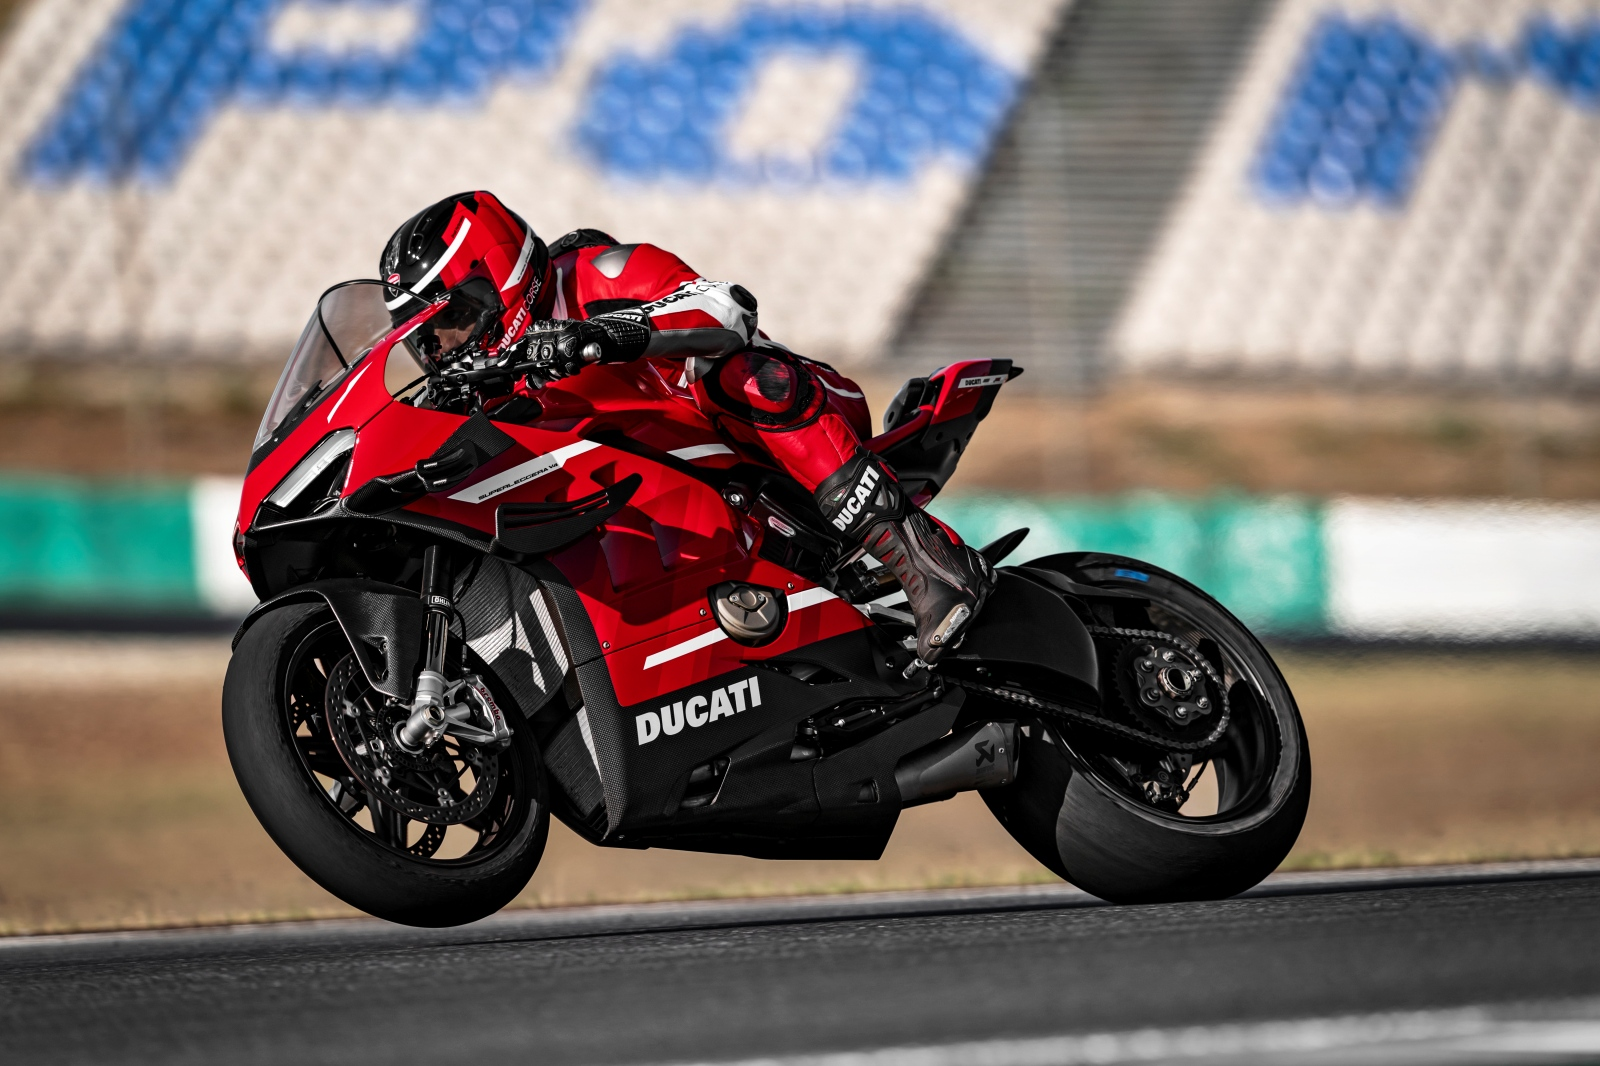 Ducati Superleggera V4 2020 en acción